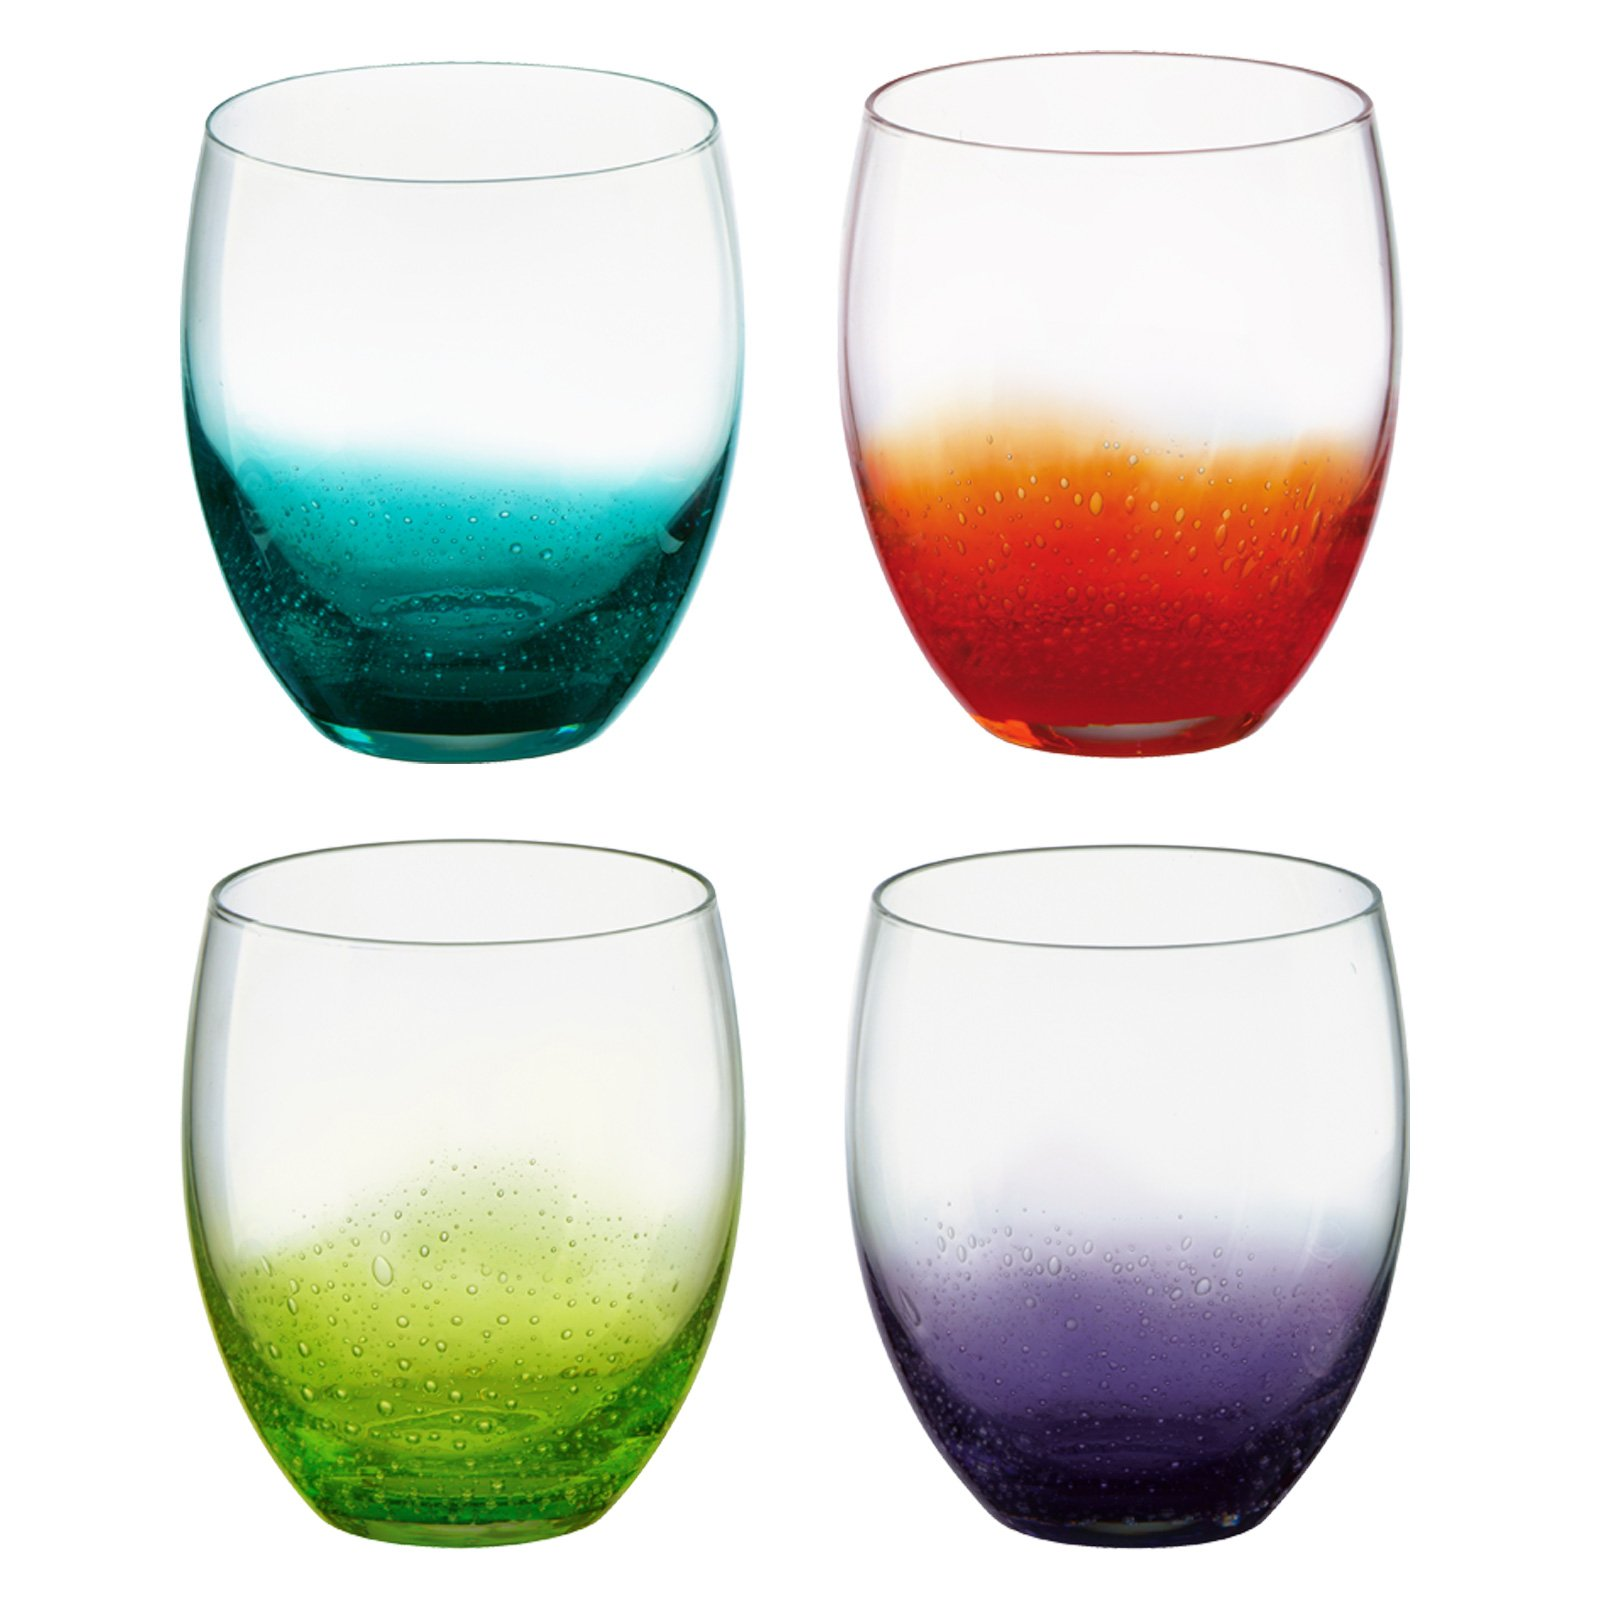 Anton Studio Designs Set of 4 Fizz Wine Glasses